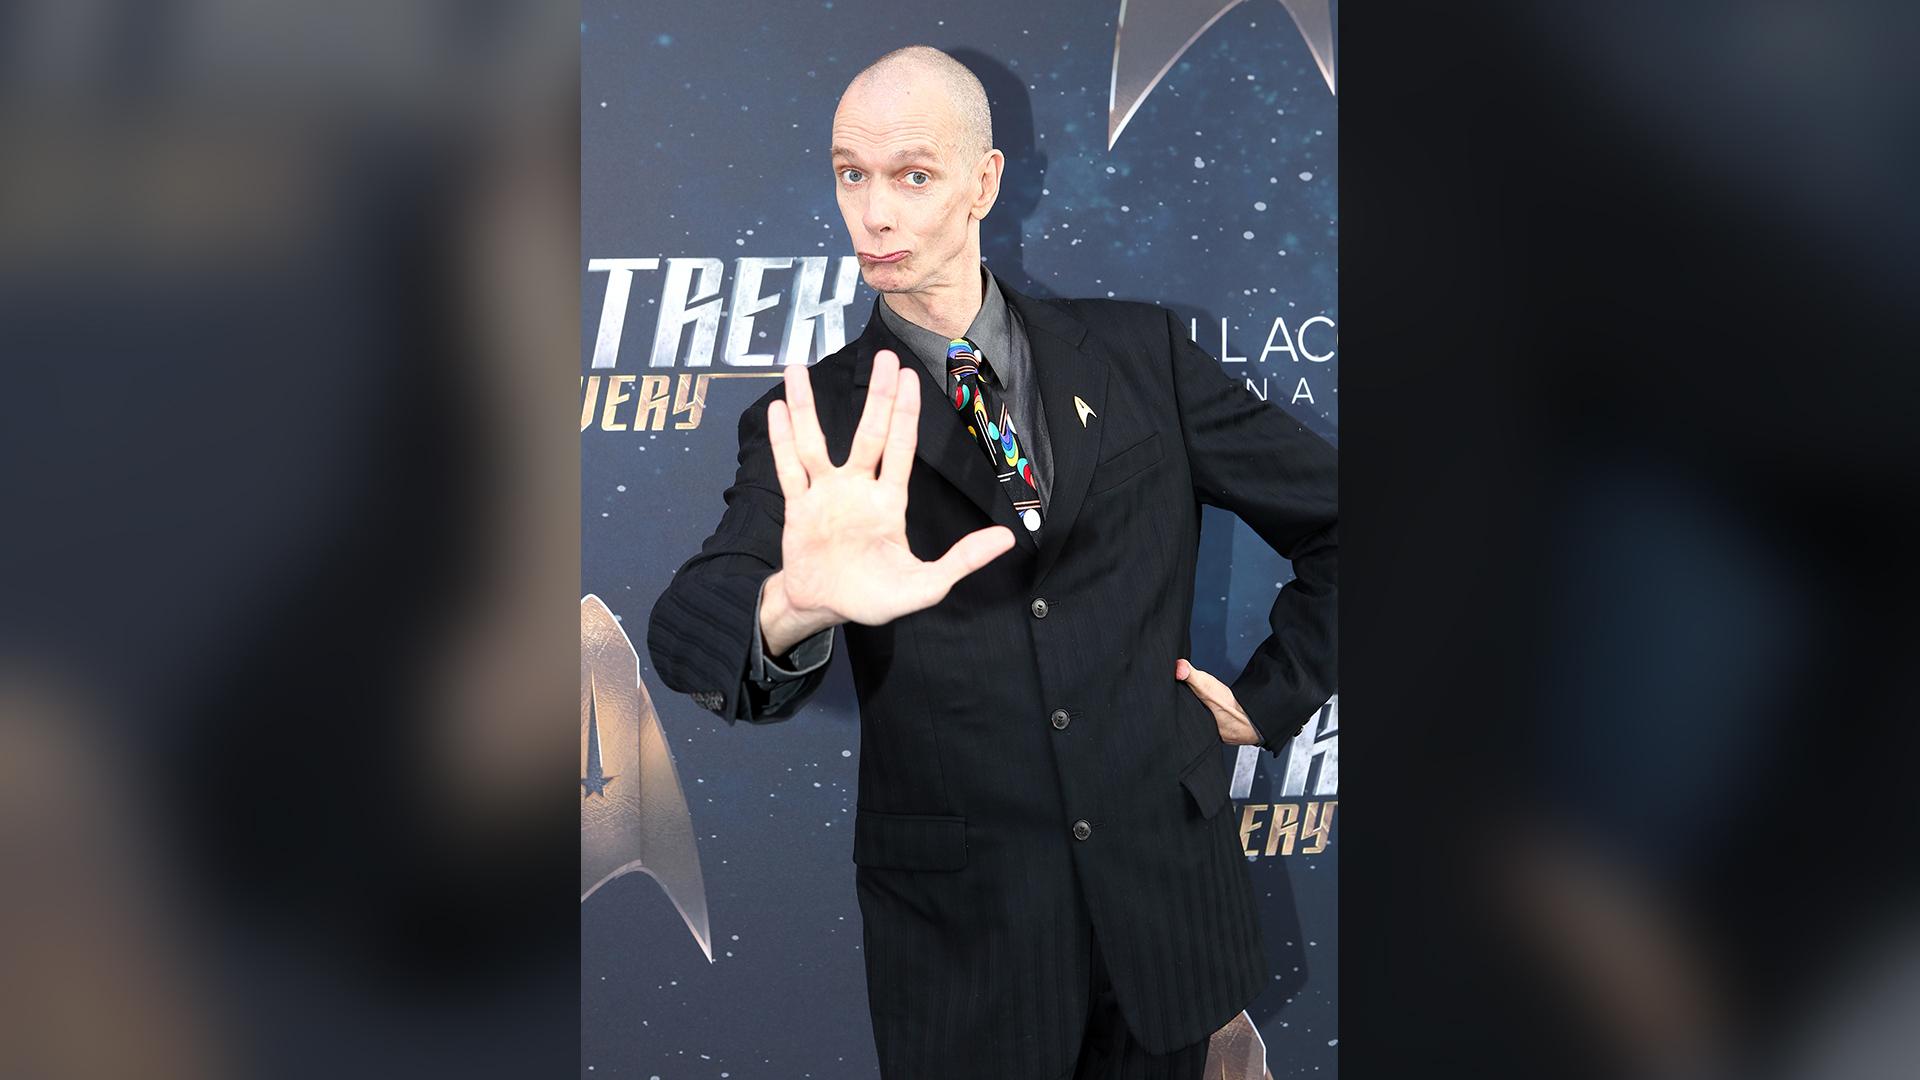 Doug Jones from Star Trek: Discovery